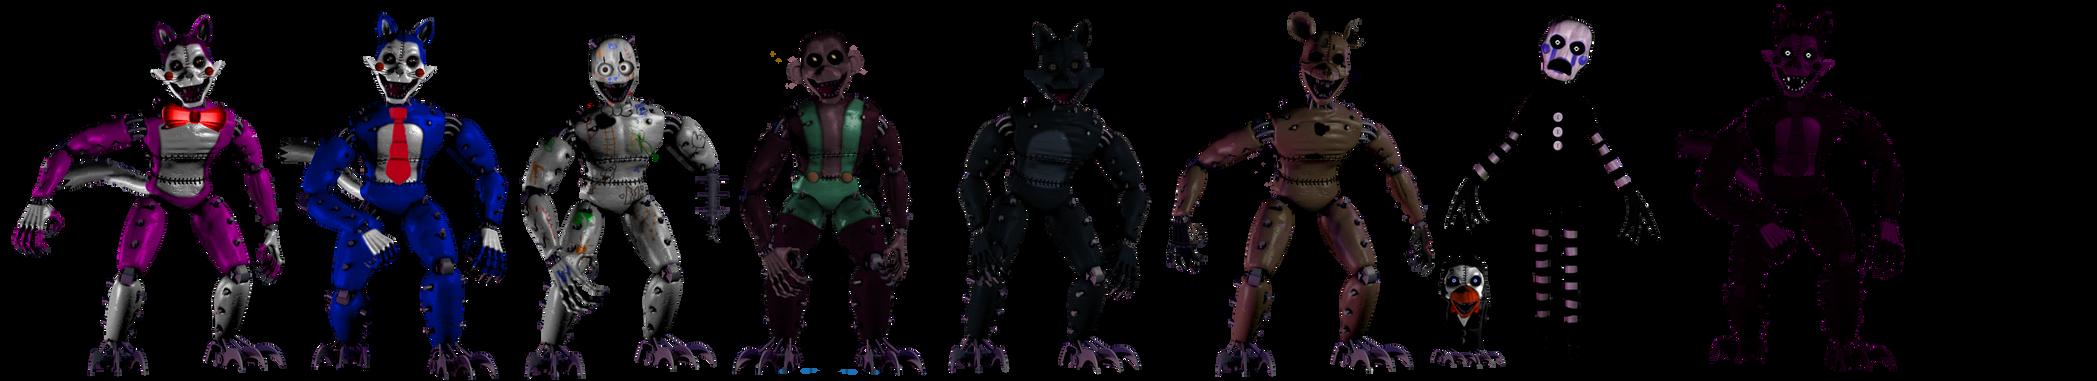 Monster Fnac 1 by shadowNightmare13